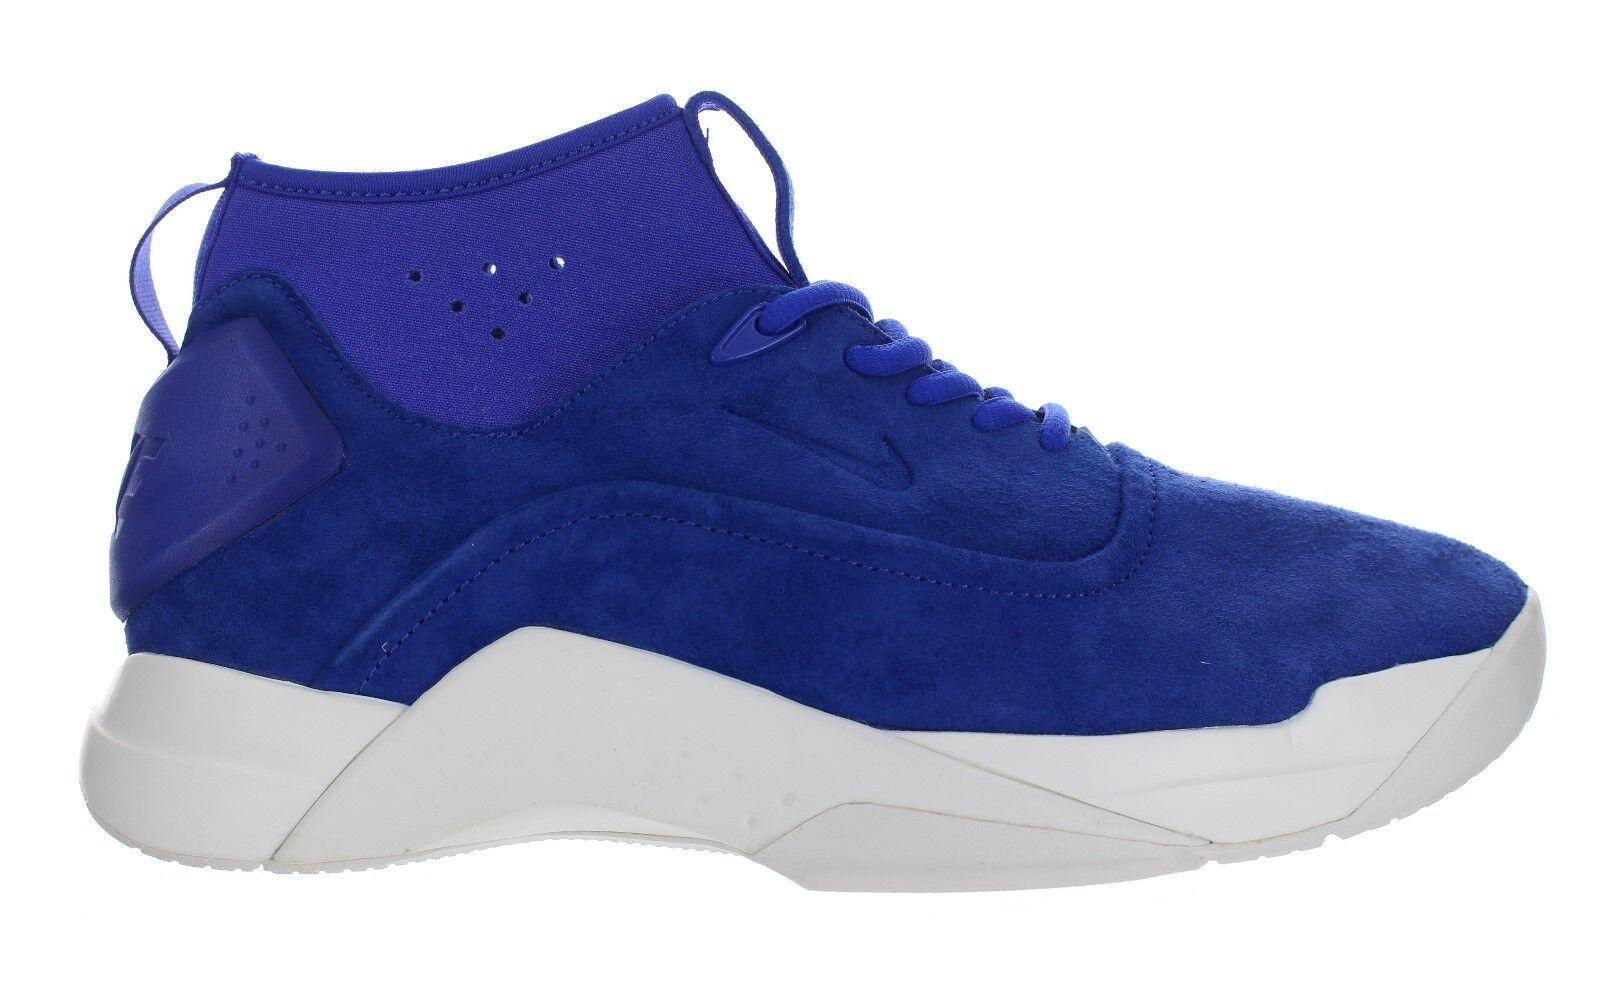 Nike uomini hyperdunk basso lux blu, scarpe da basket 9 nuove dimensioni